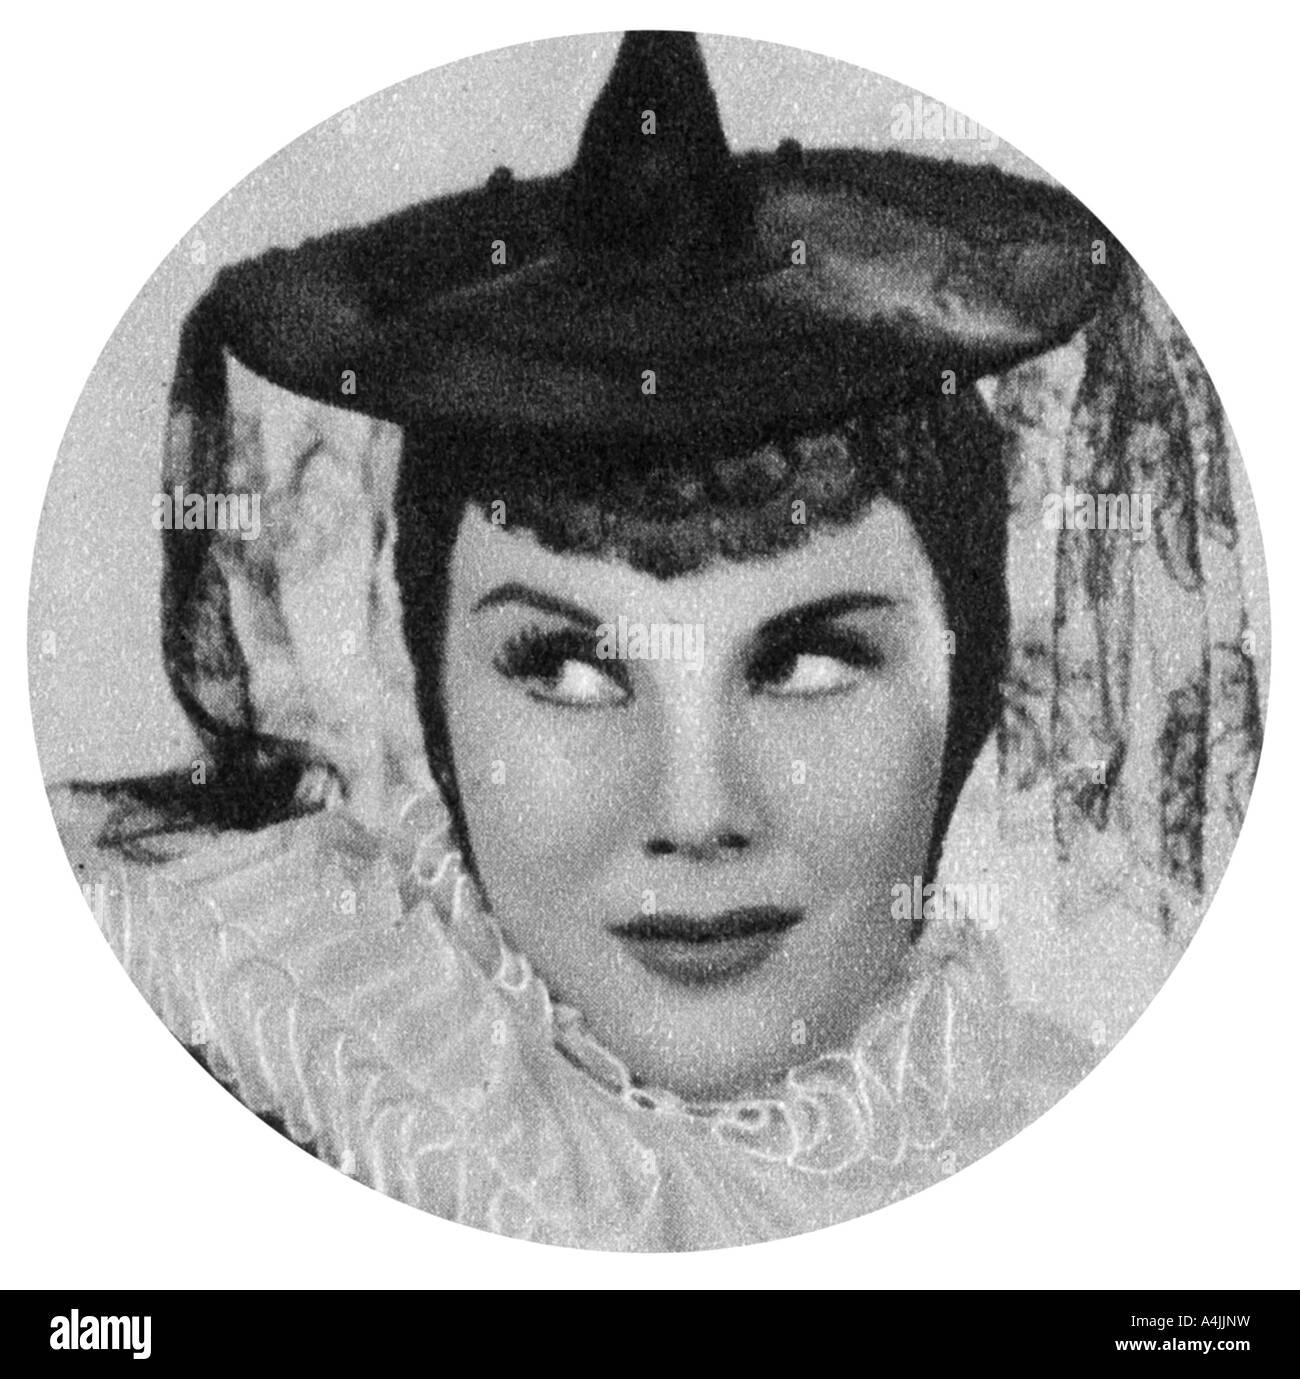 joan gardner obituary